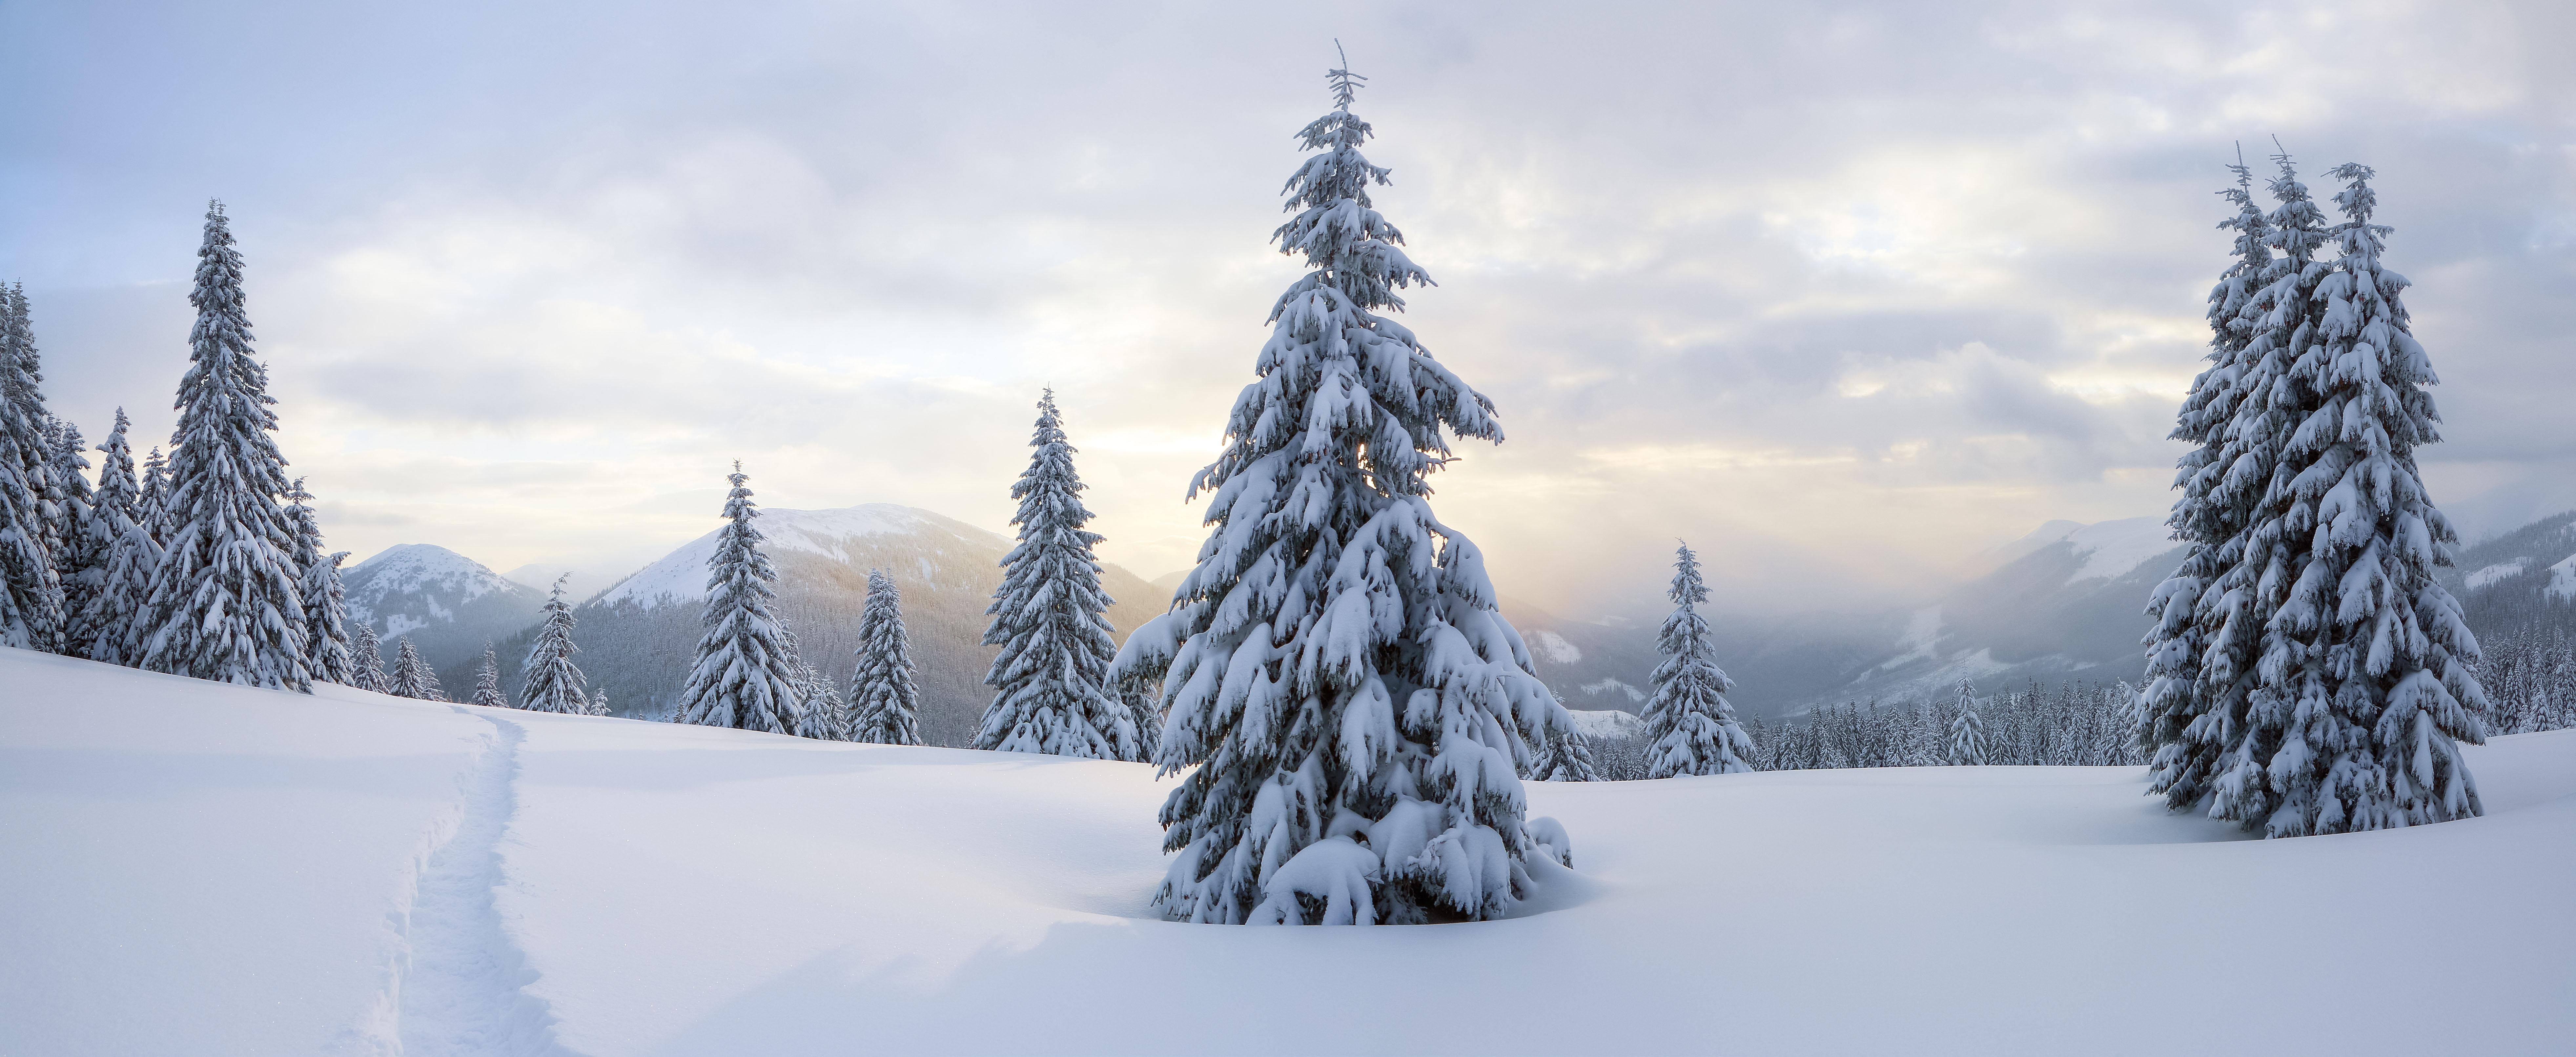 Prescott National Forest Christmas Tree Permits 2021 Kaibab Forest Christmas Tree Permits Available Now Williams Grand Canyon News Williams Grand Canyon Az